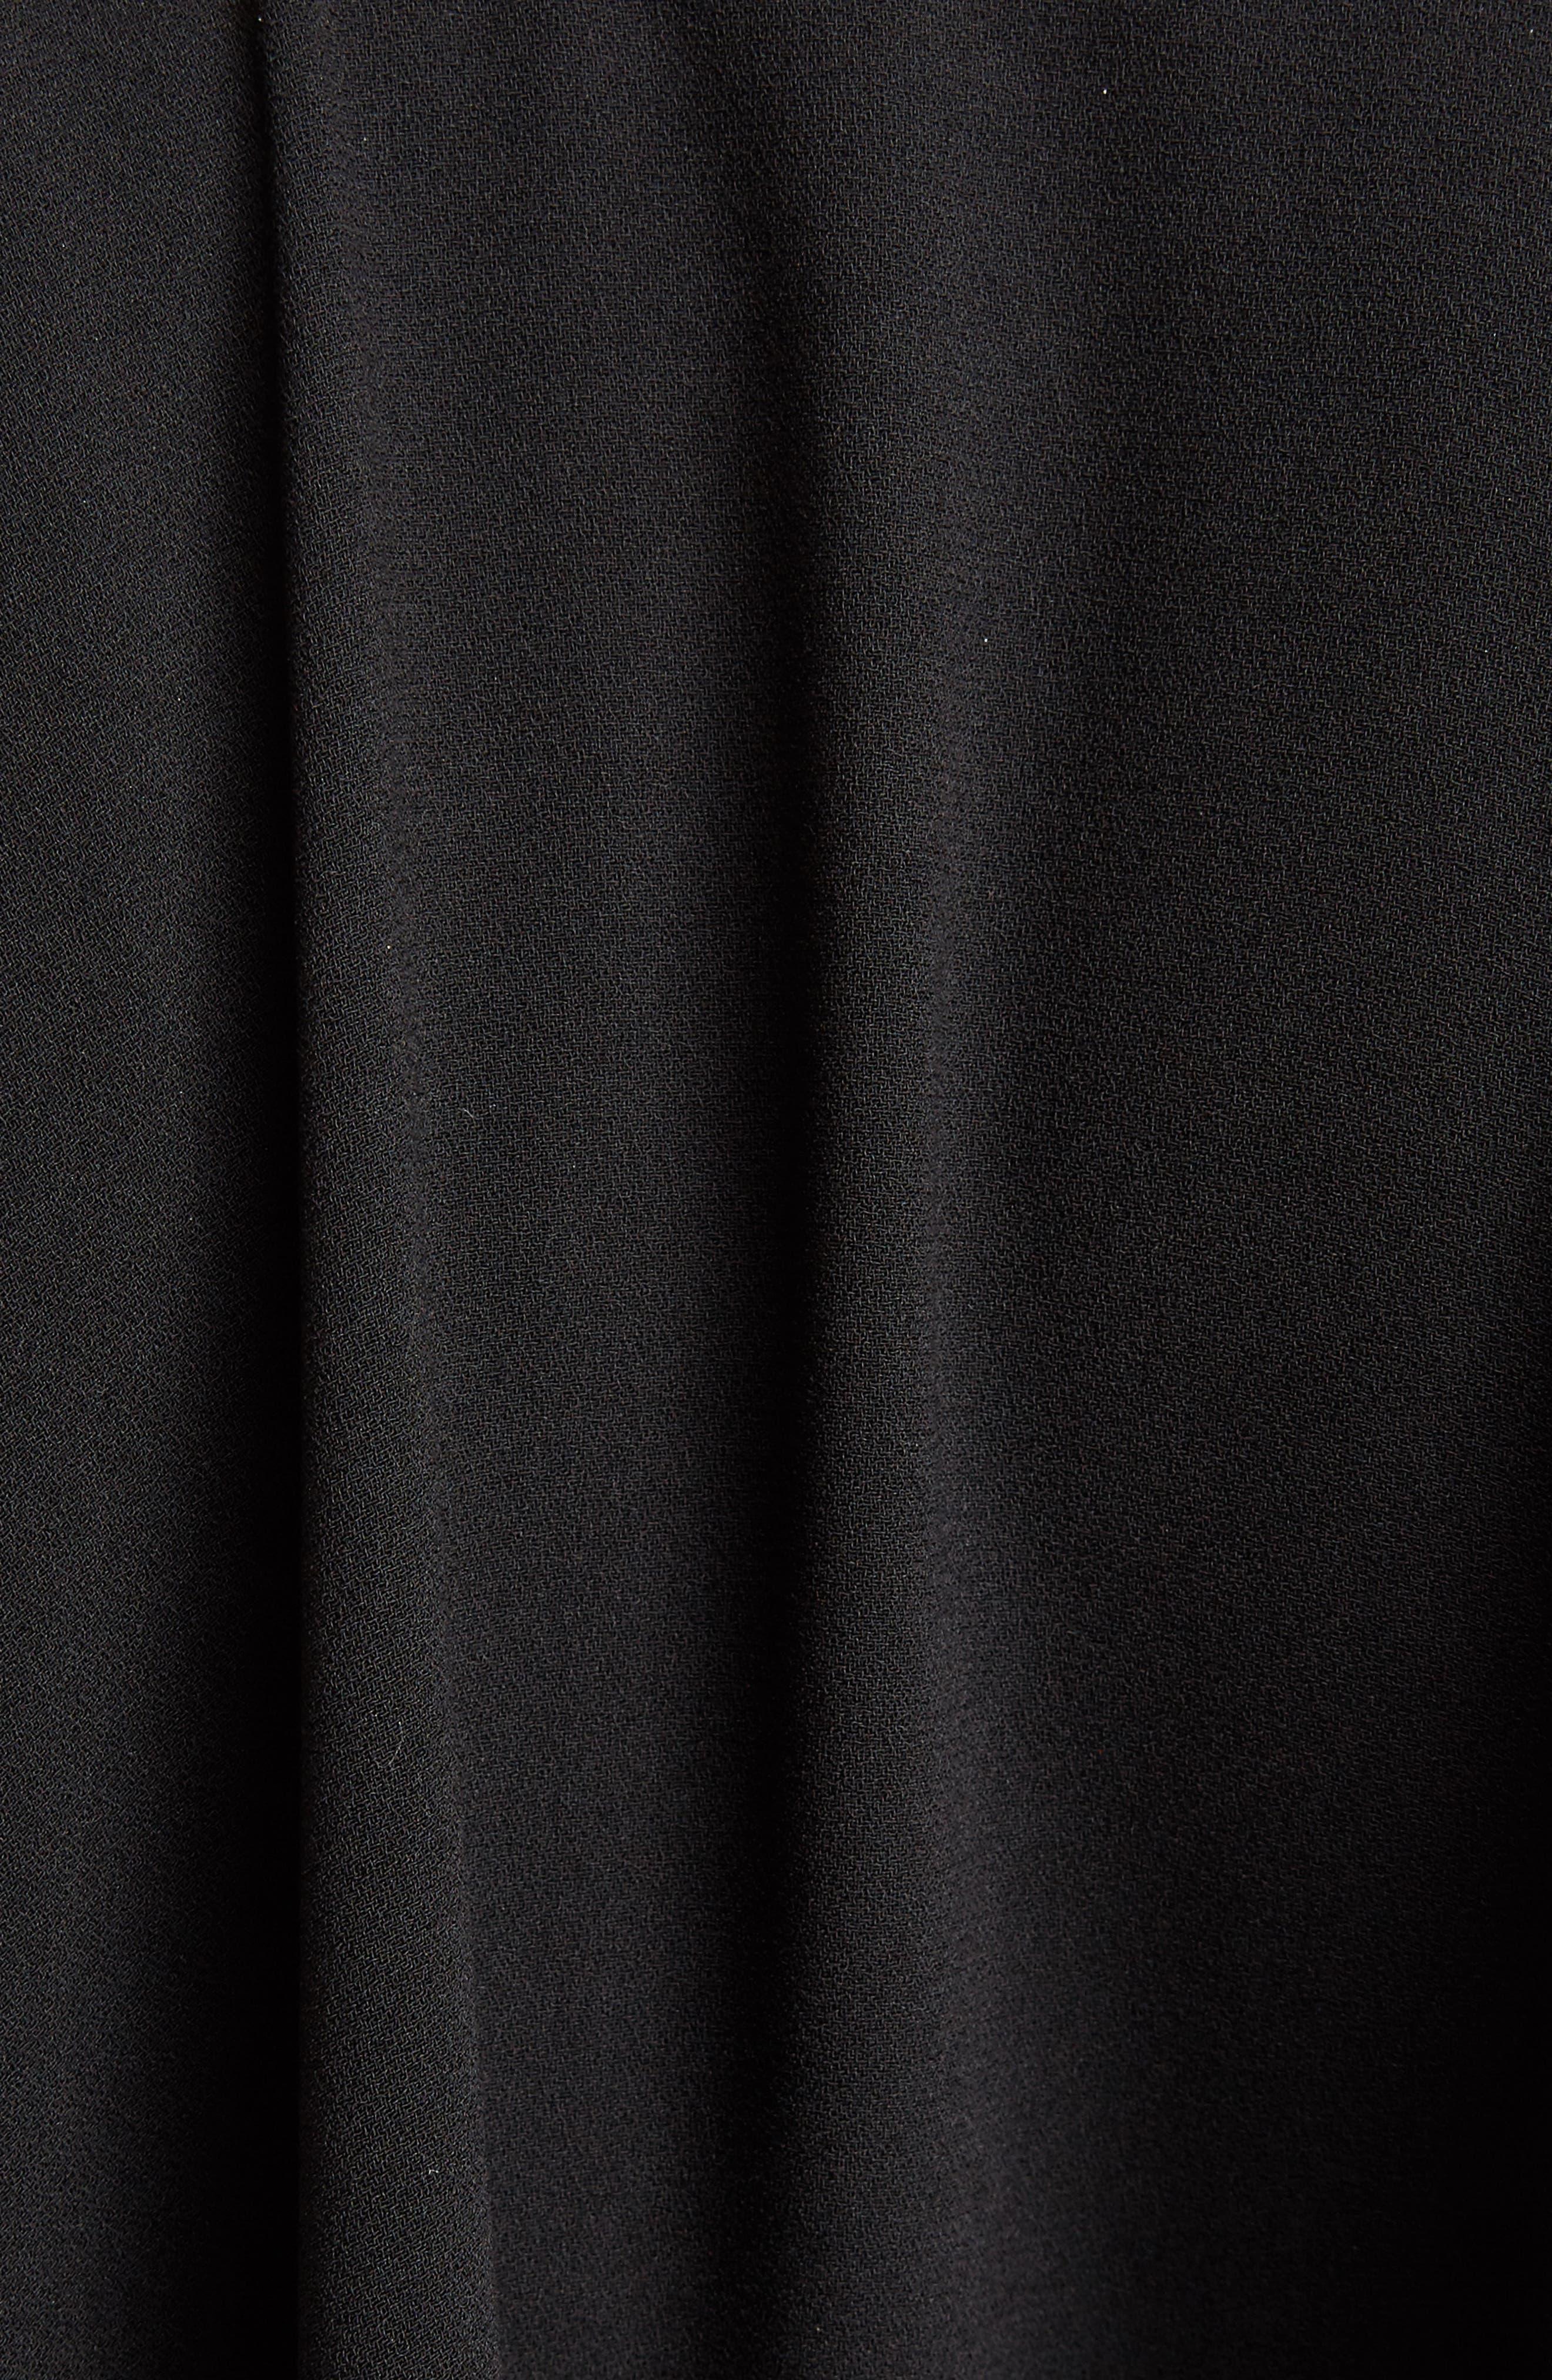 J.W.ANDERSON Cap Sleeve Maxi Dress,                             Alternate thumbnail 5, color,                             001